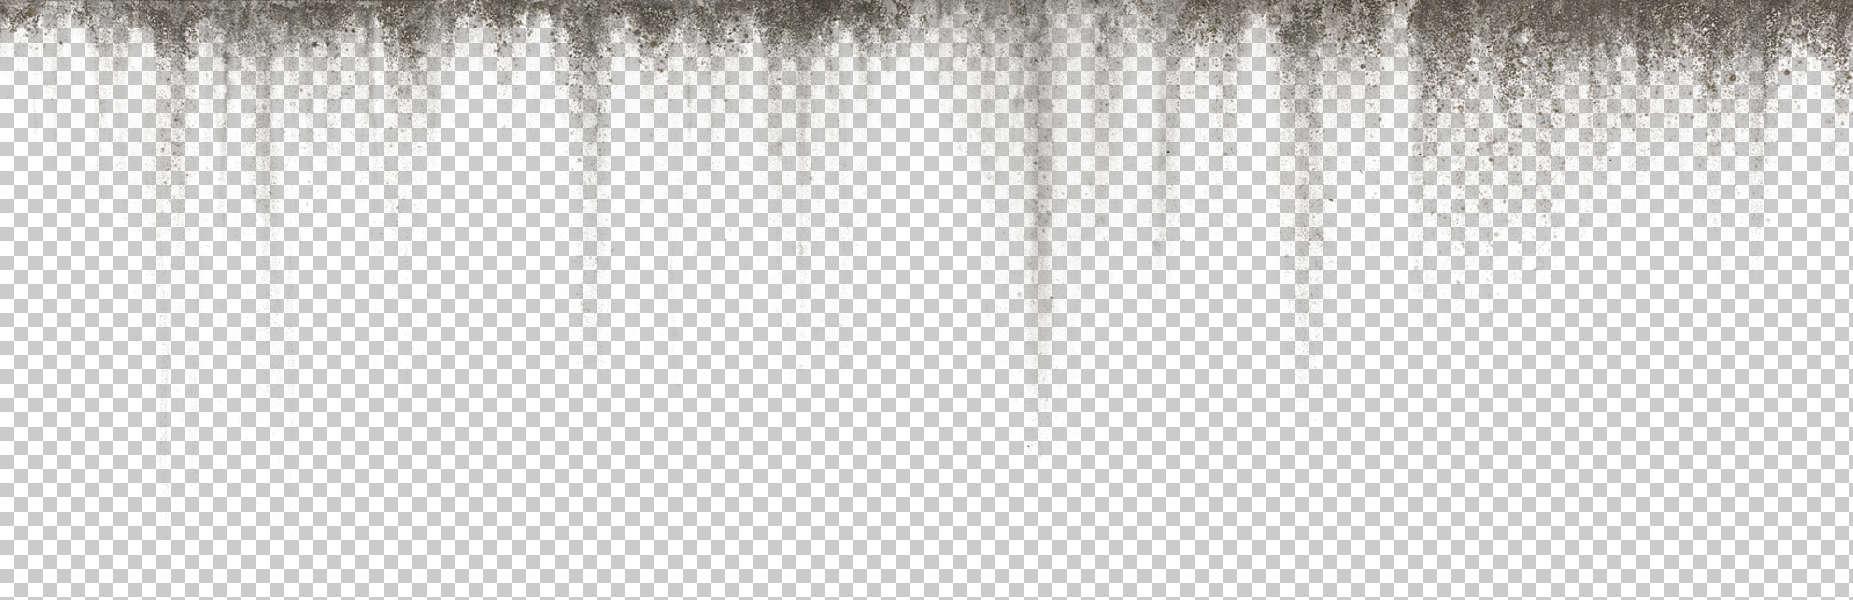 Decalsleaking0235 Free Background Texture Decal Leak